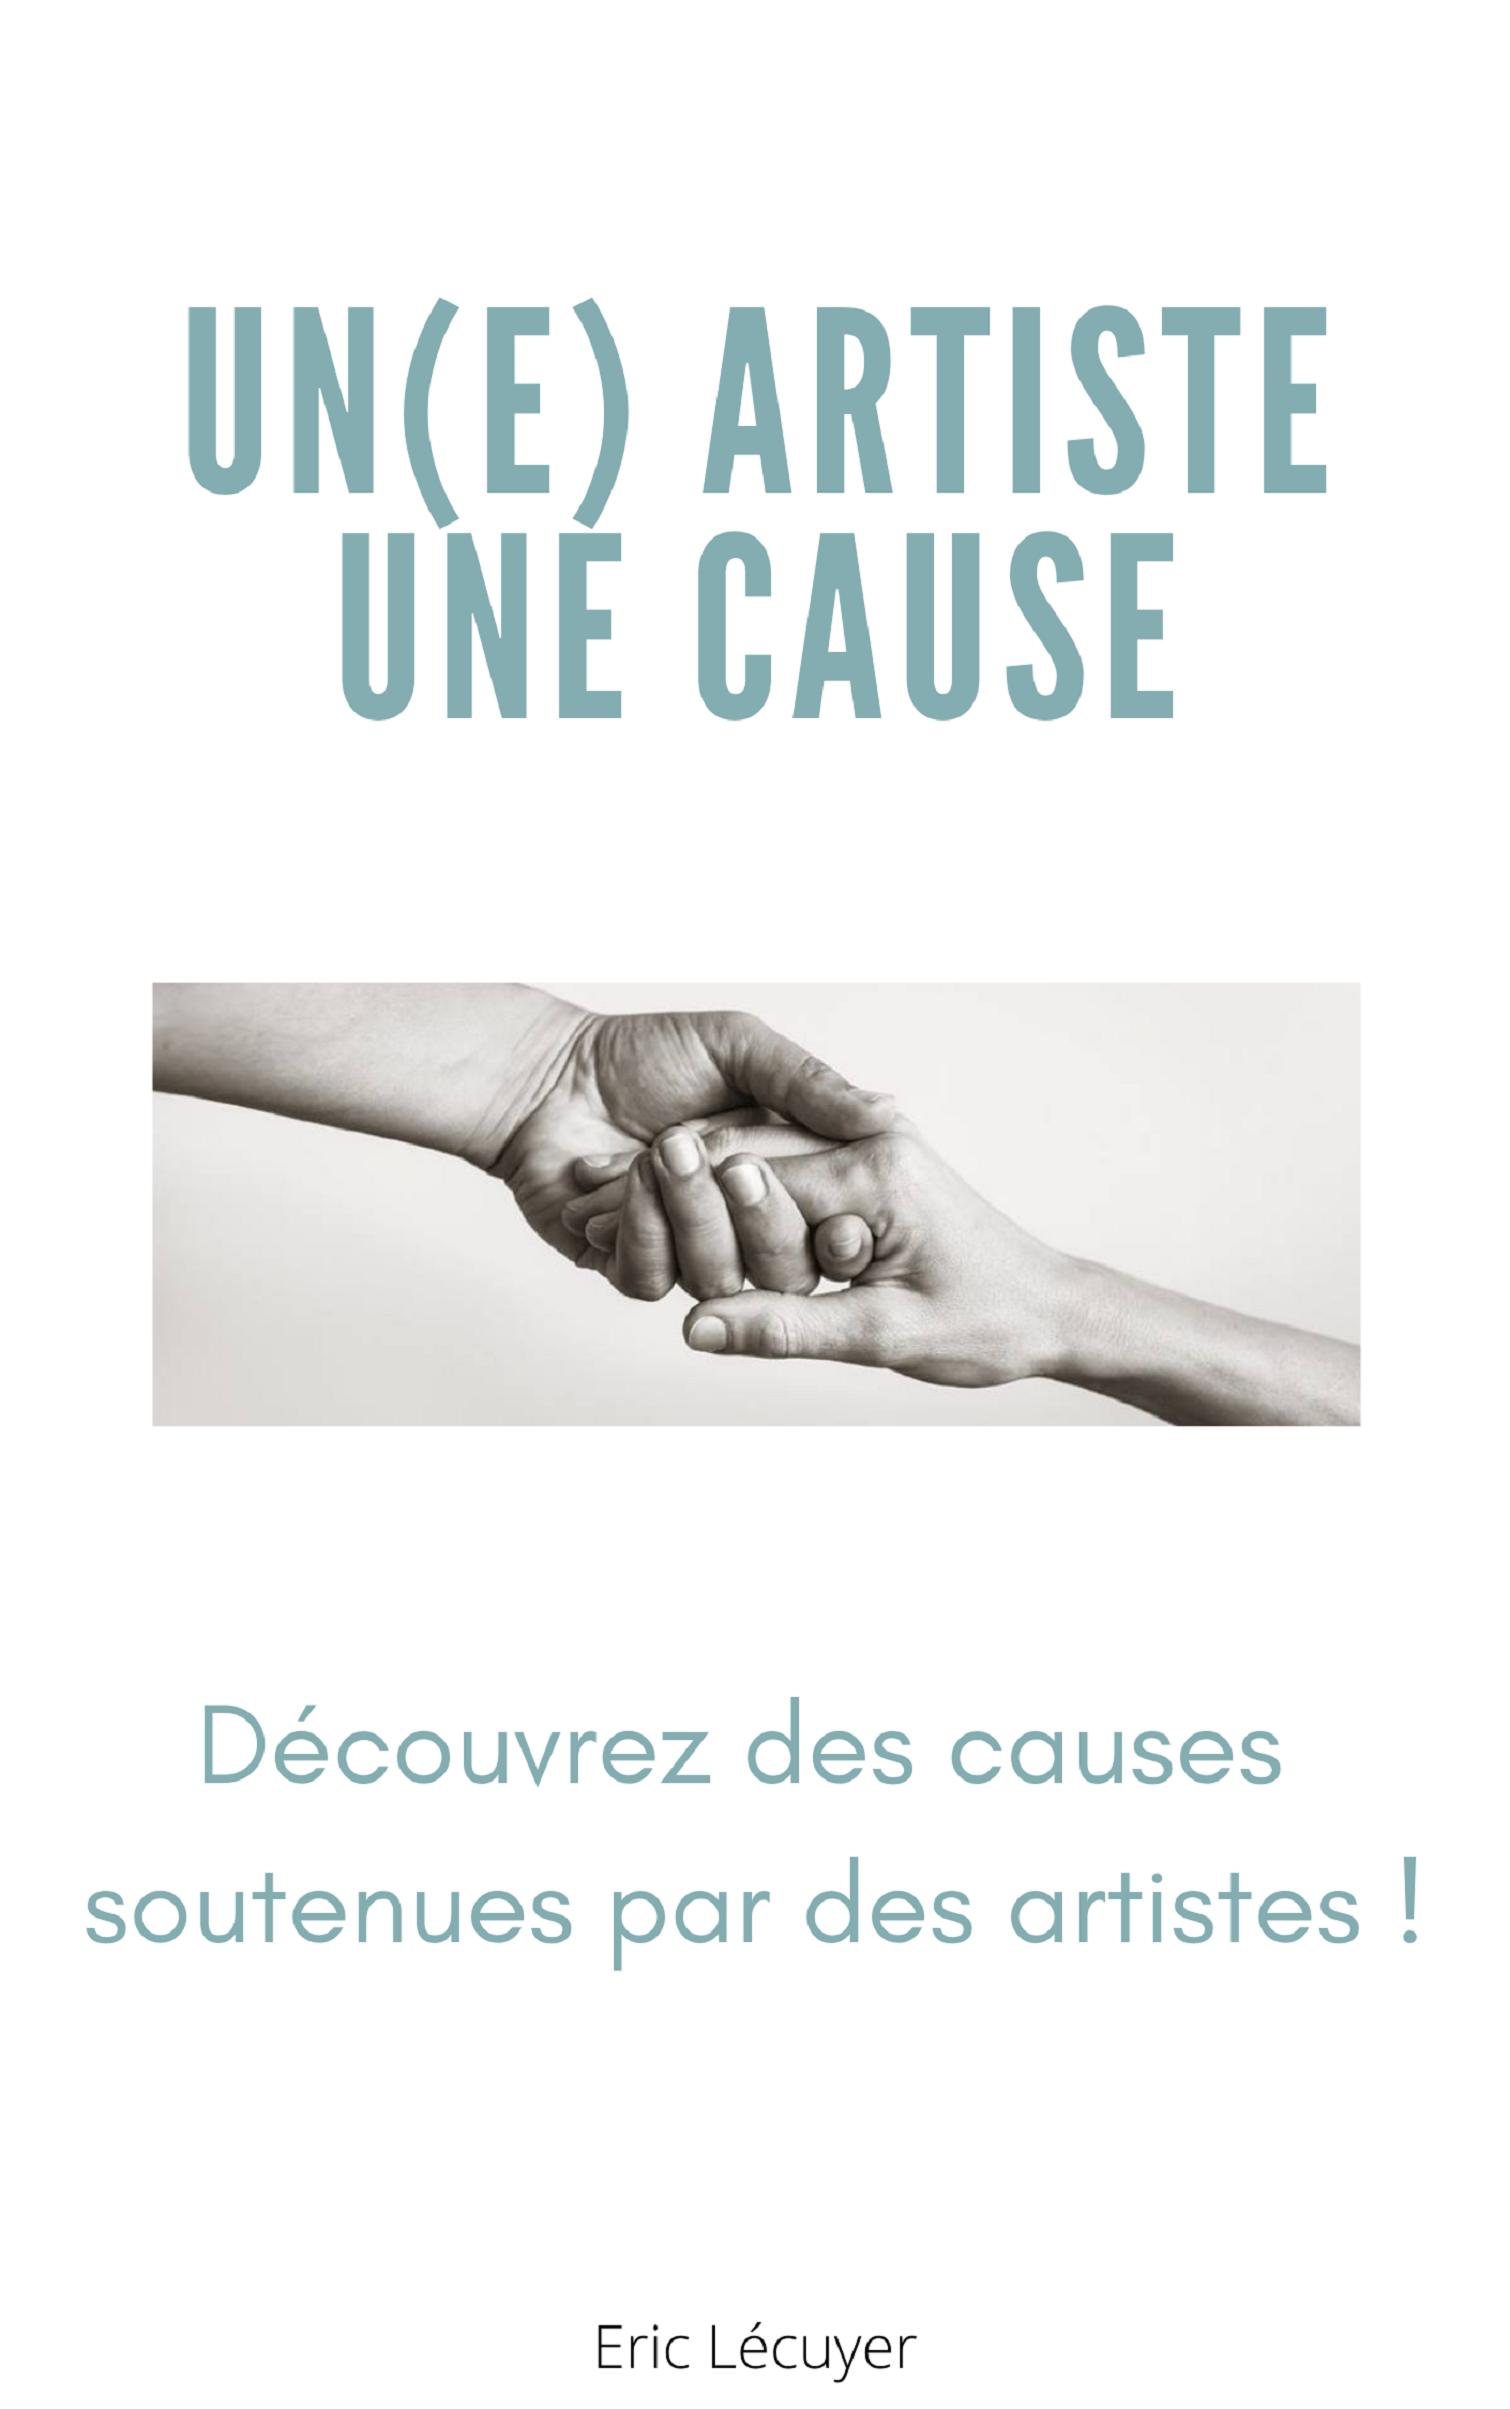 Un(e) artiste, une cause Image